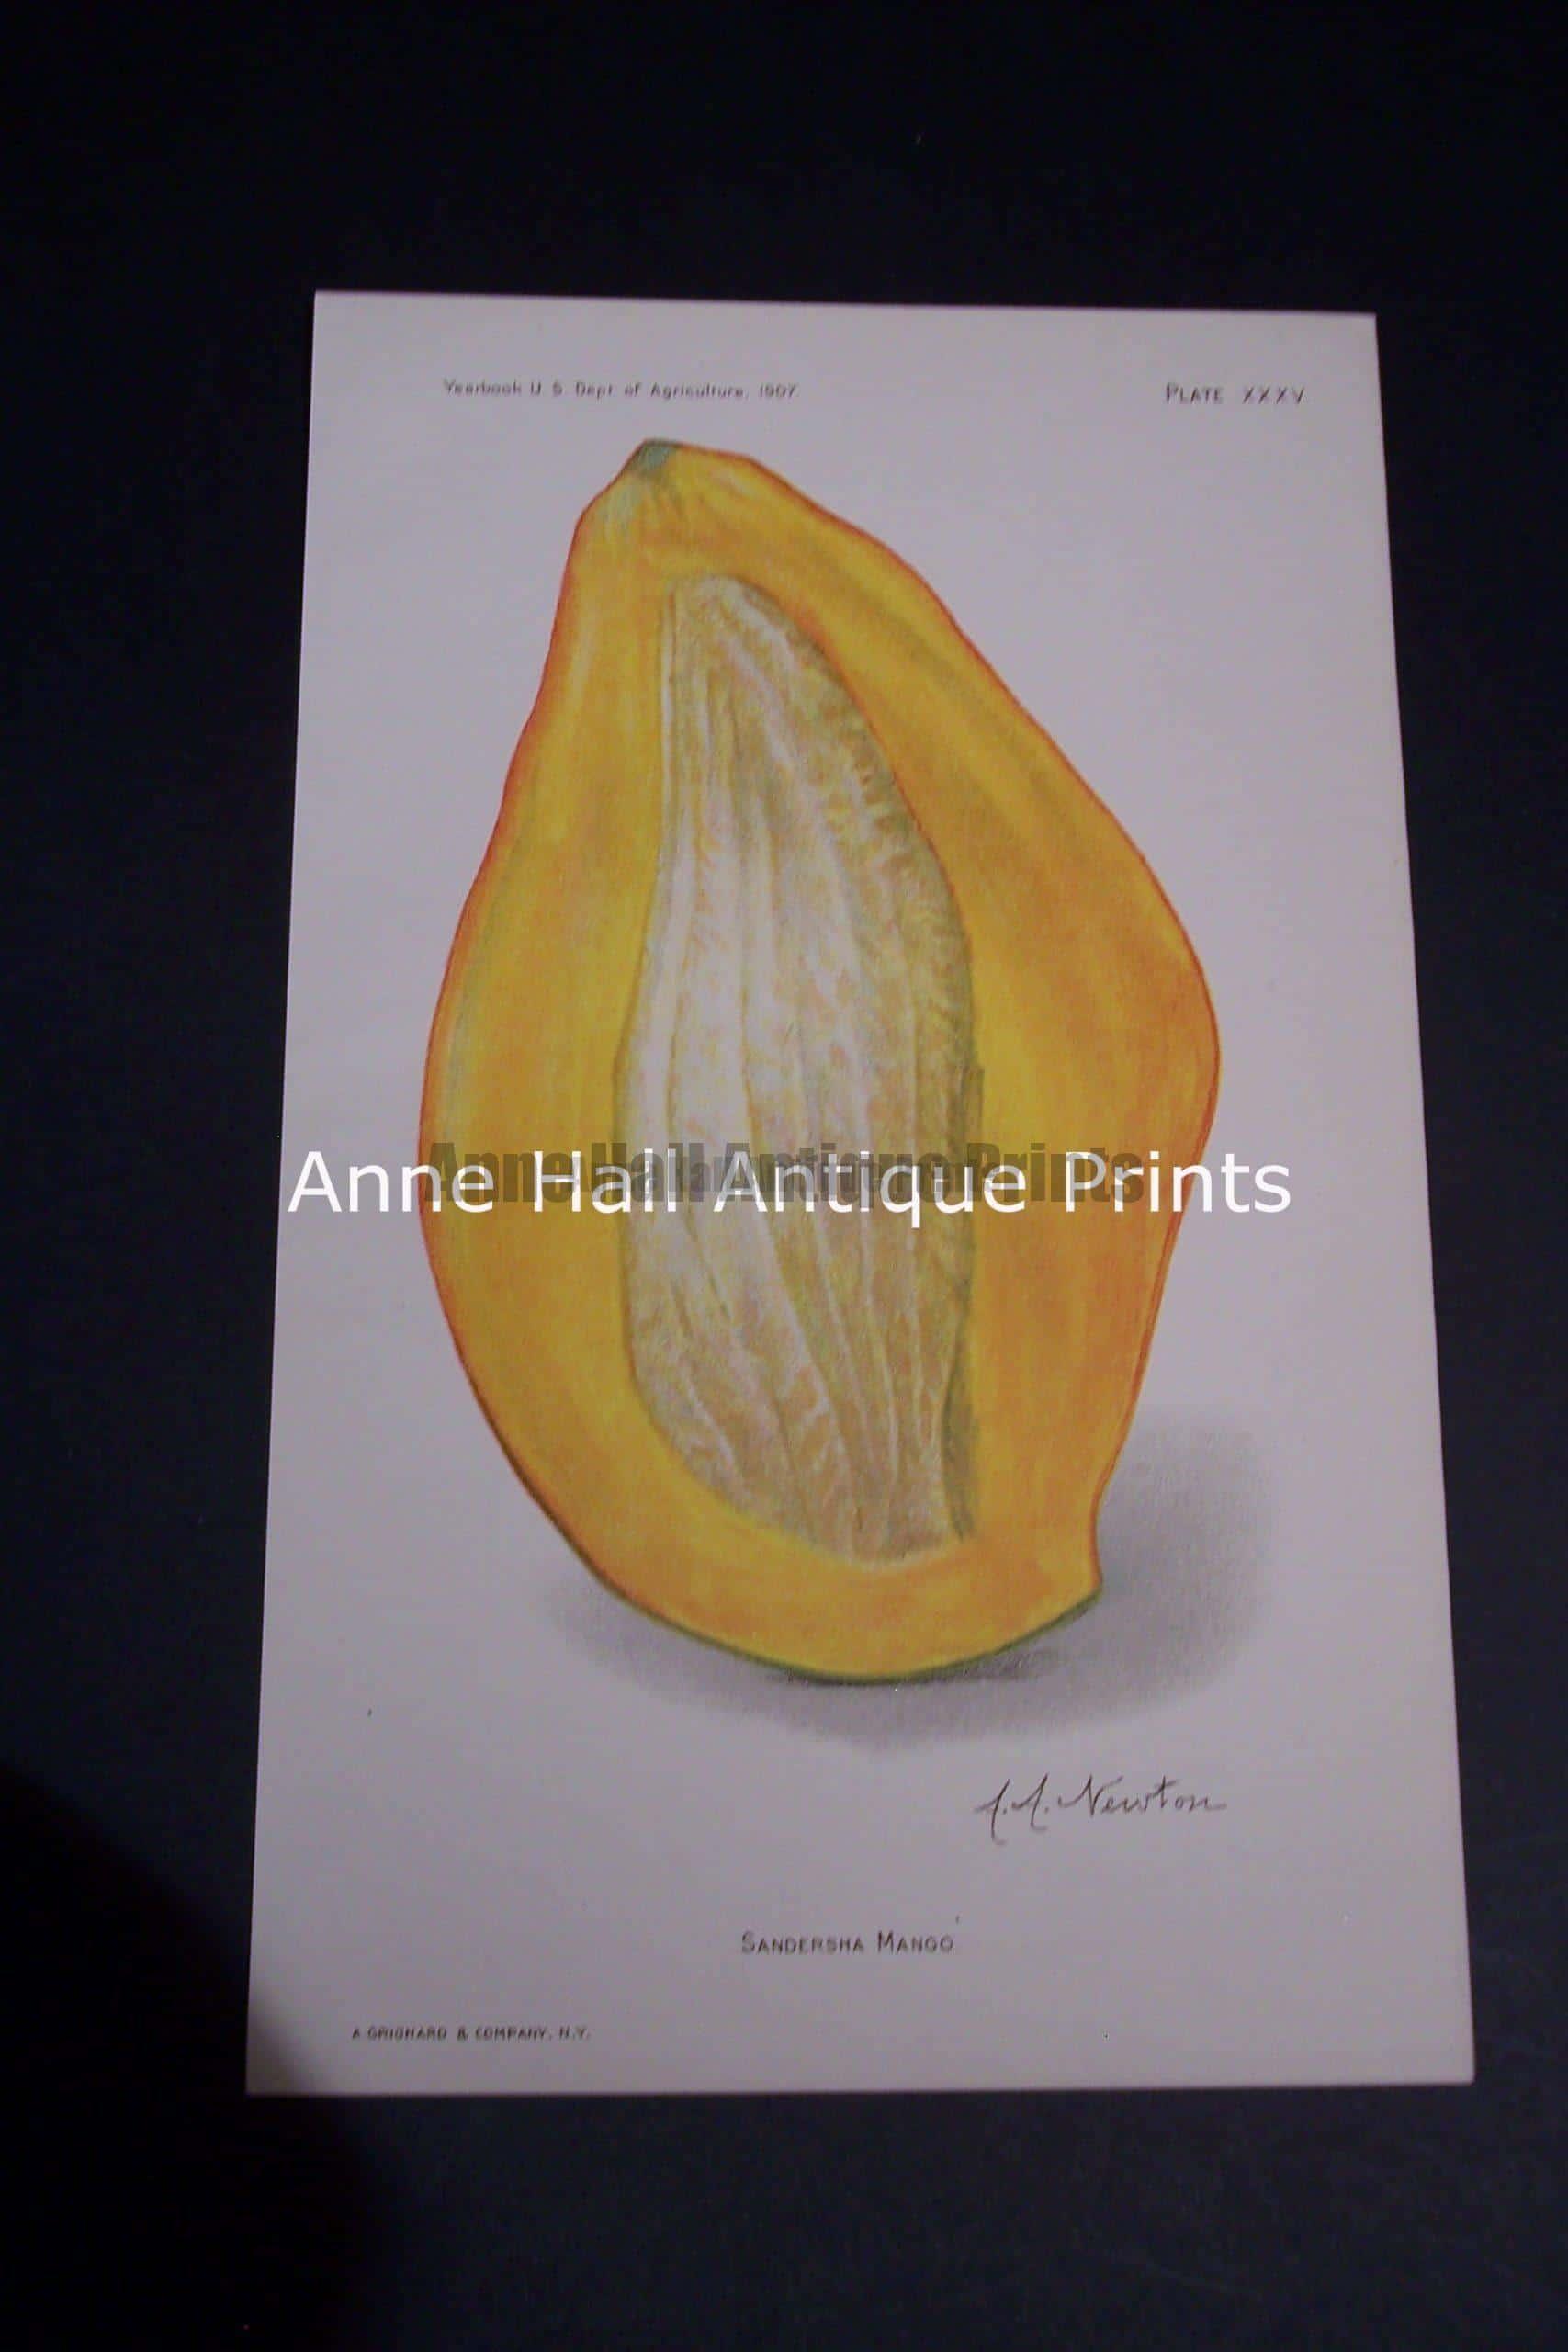 Fruit USDA Sandersha Mango